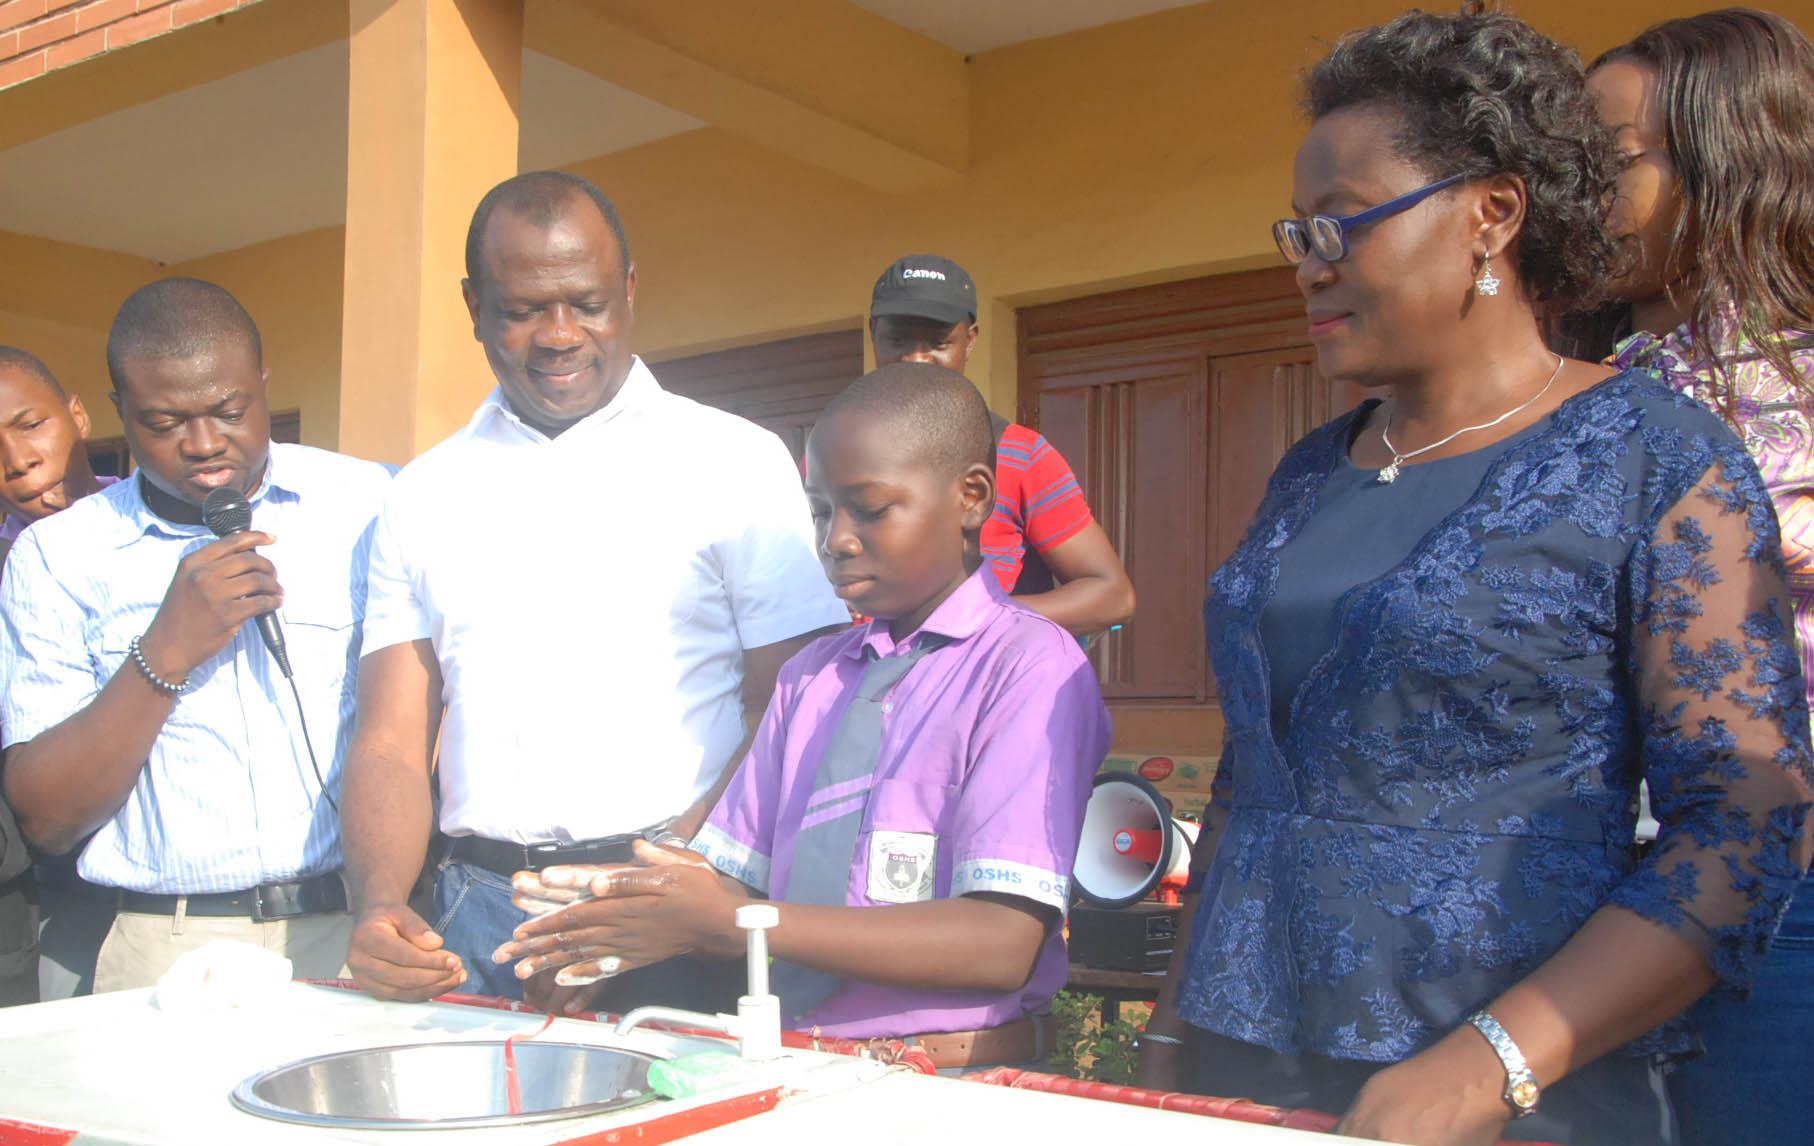 Unilever handwashing activity at Oregun High school 2